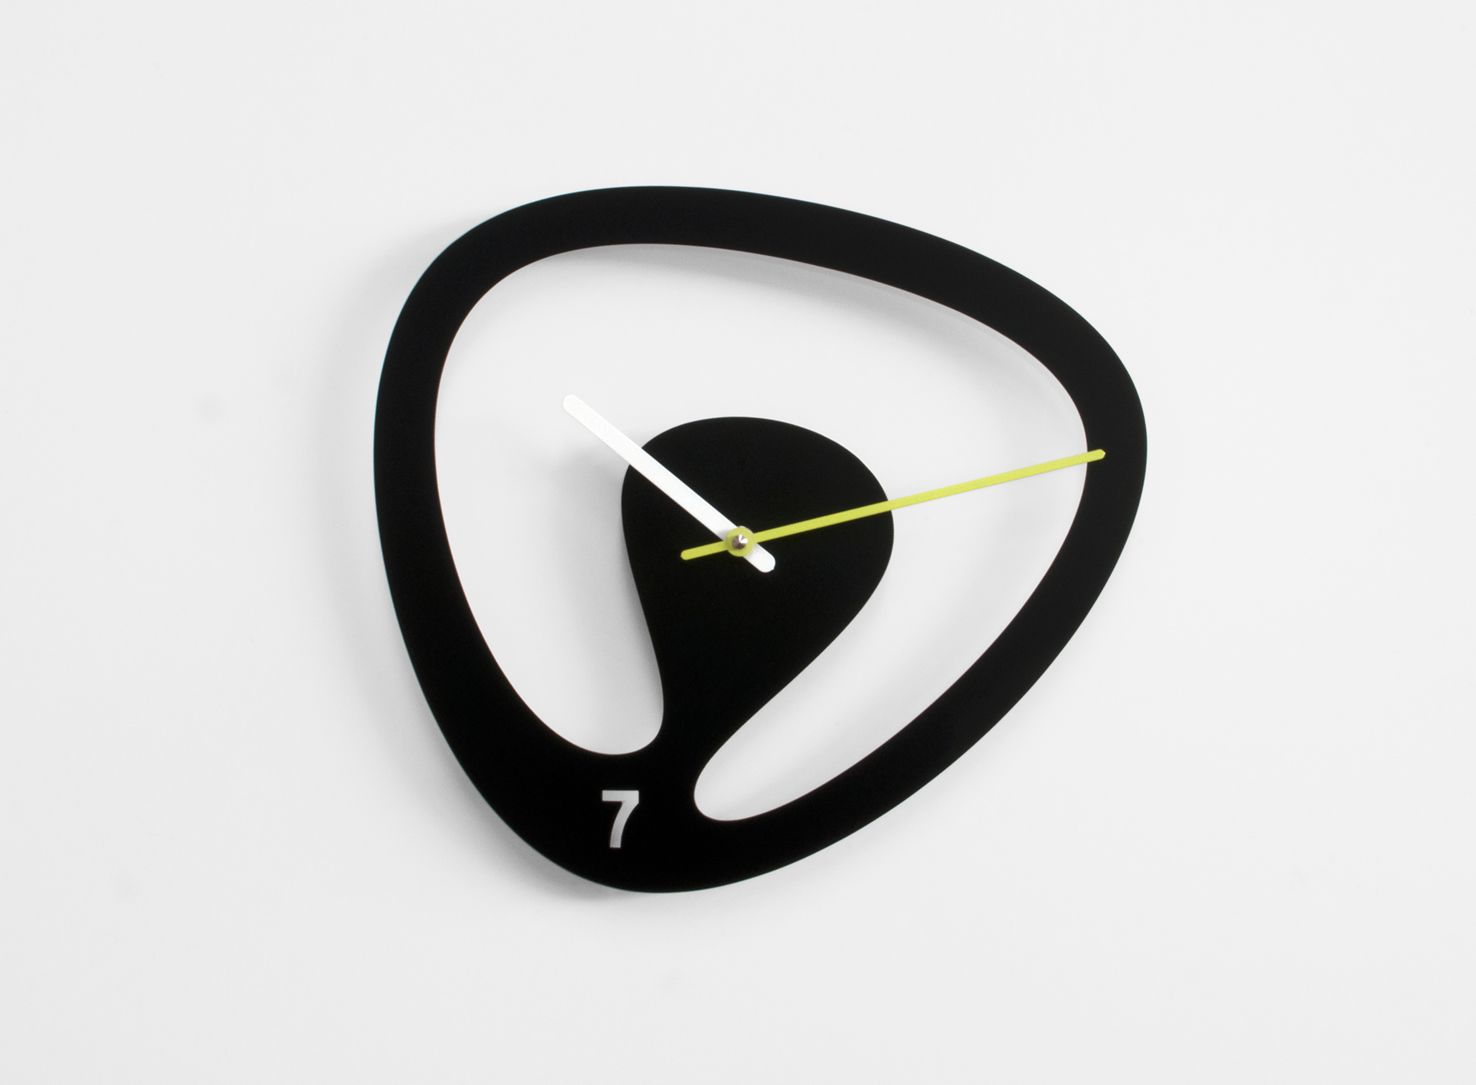 Wall Clocks | Seven Modern Wall Clock Design Karim Rashid Another Creation  By